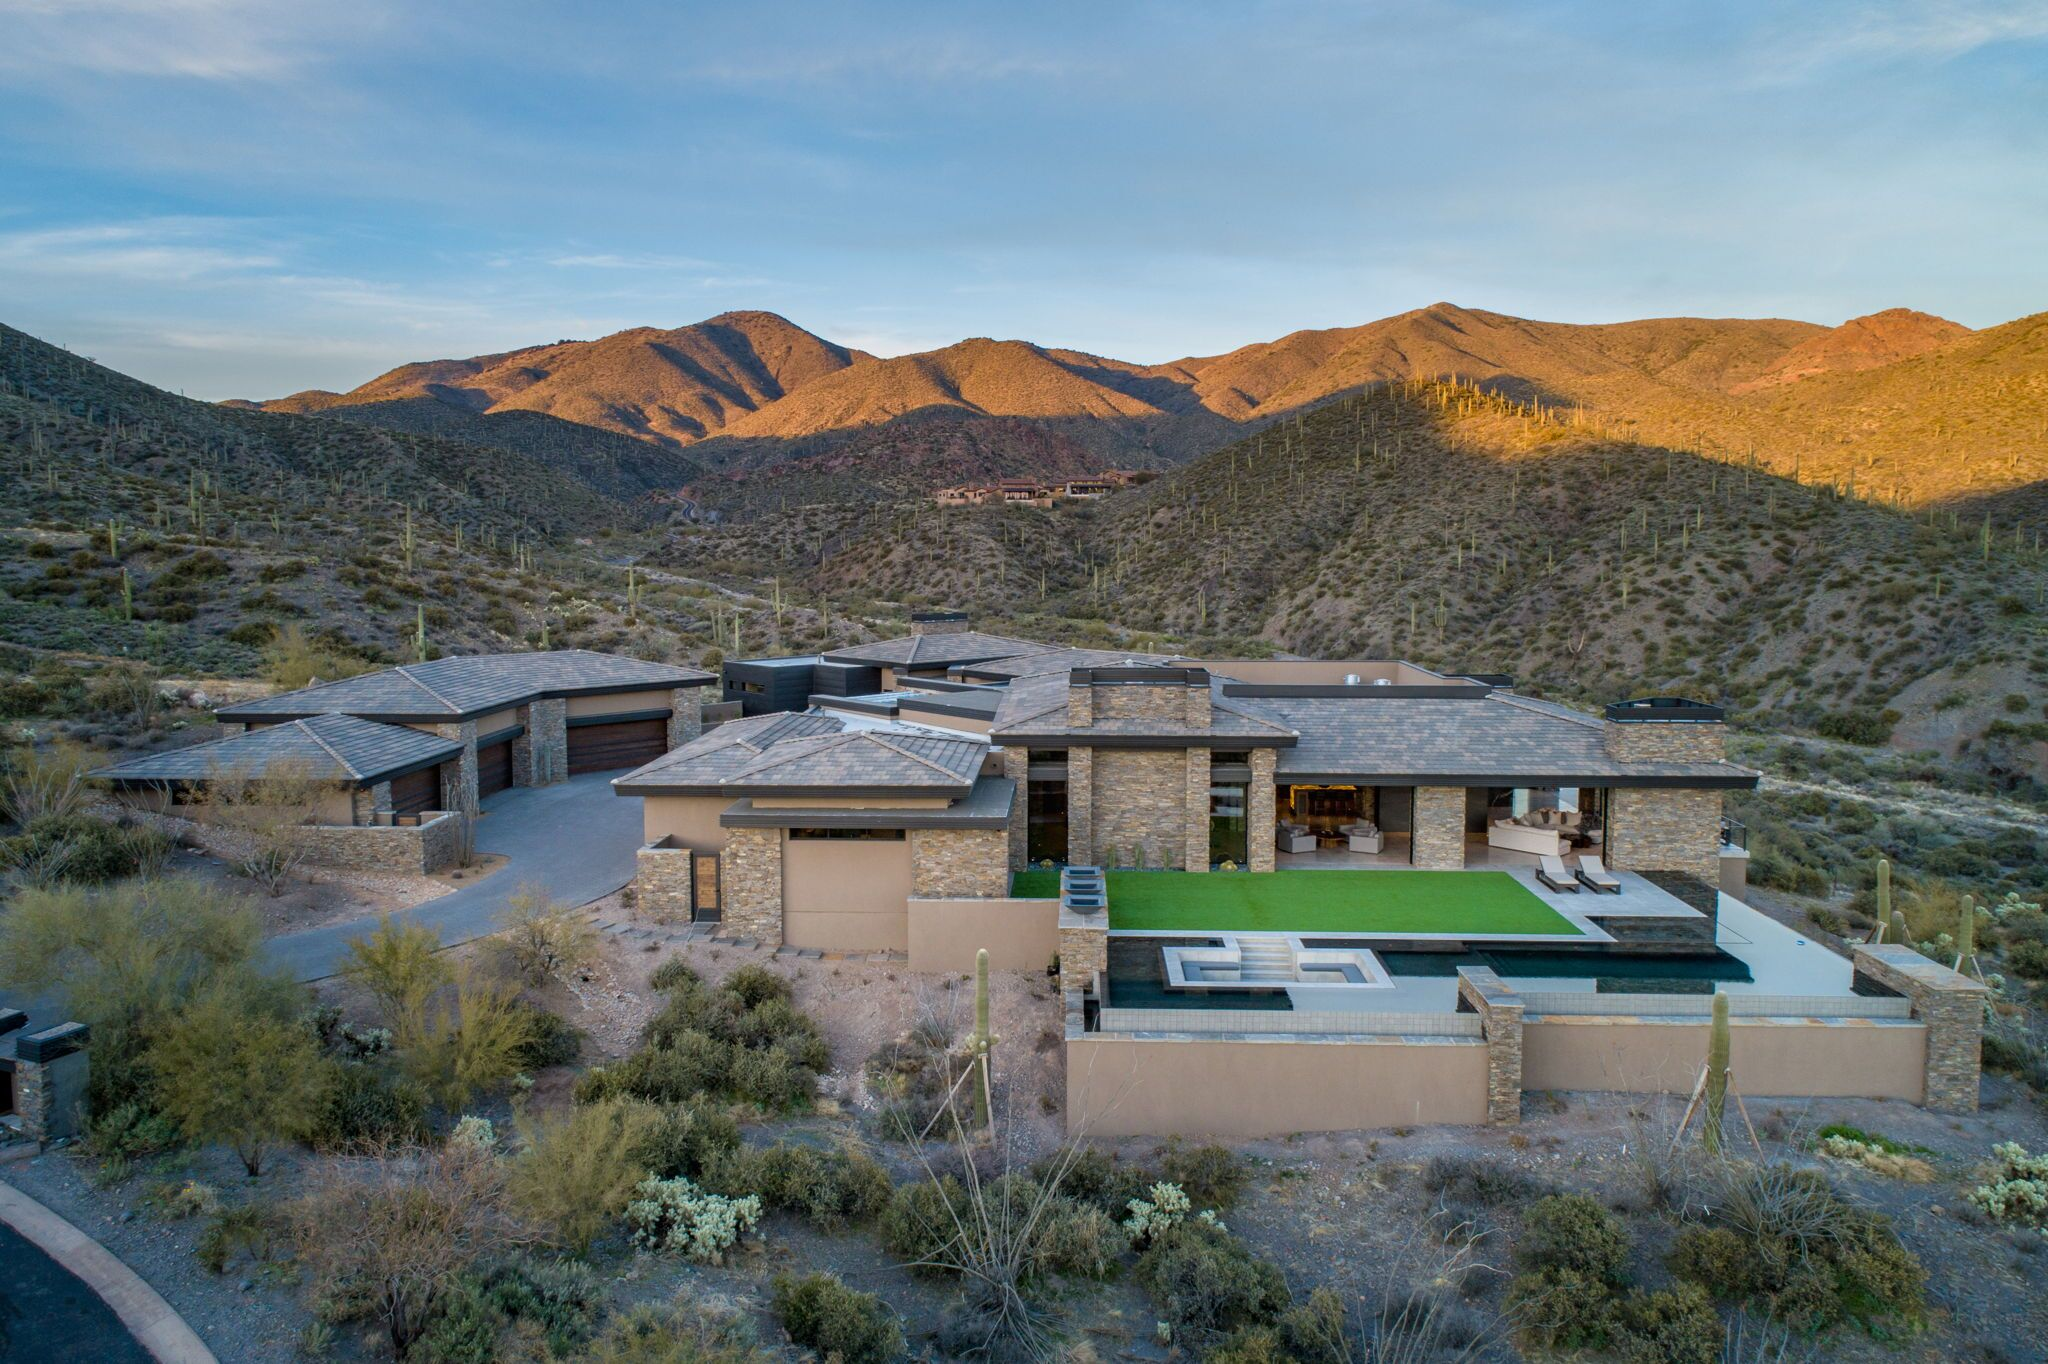 9300+E+Grapevine+Pass+Scottsdale-62-WebQuality-Stunning+Mountain+Setting.jpg